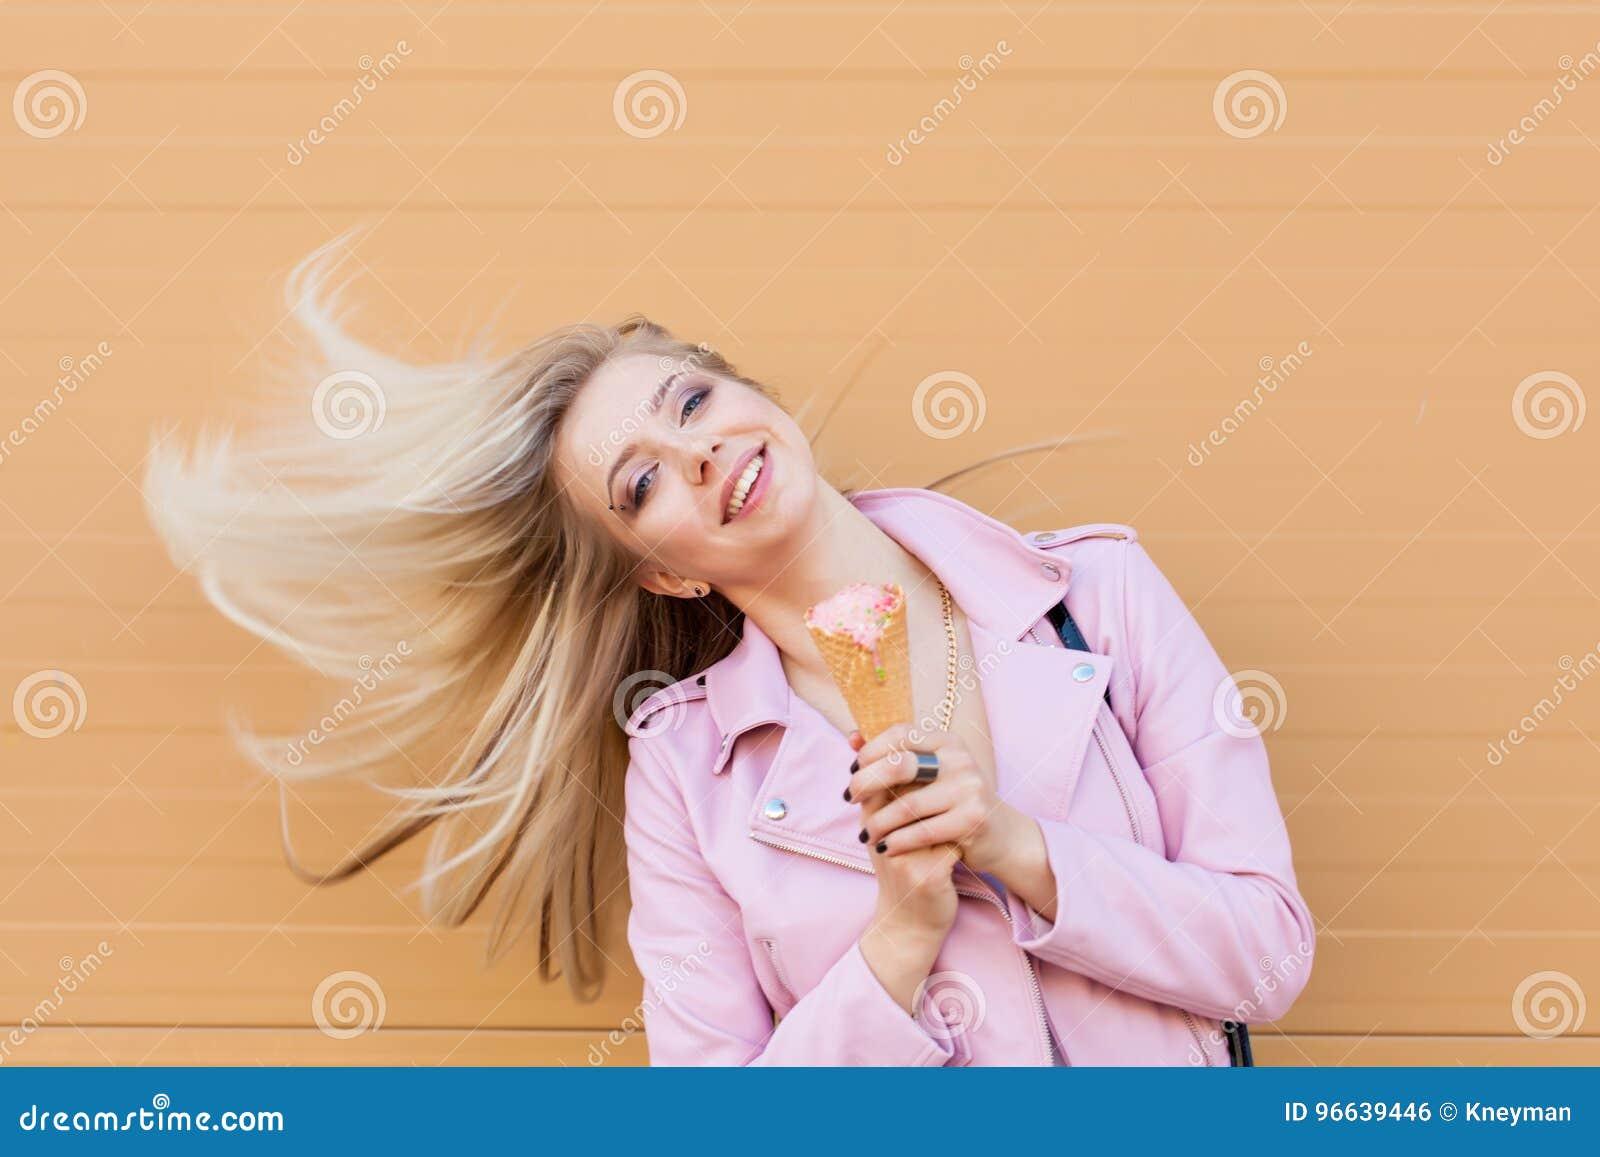 Blondes chatte adolescentsvidio chatte chaude